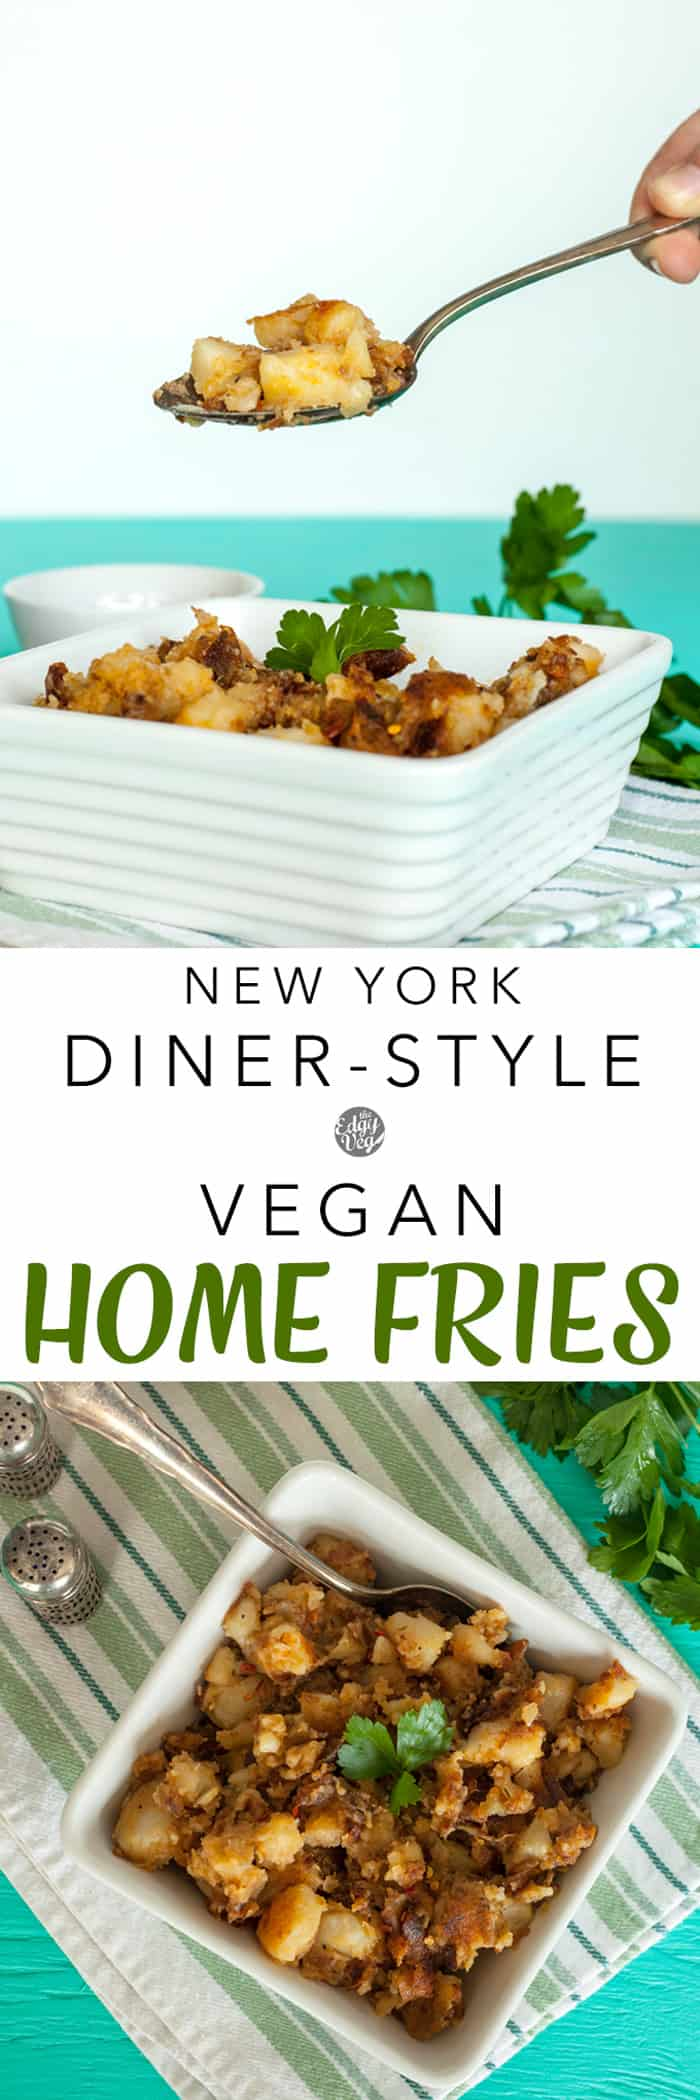 recipe for home fries vegan recipe